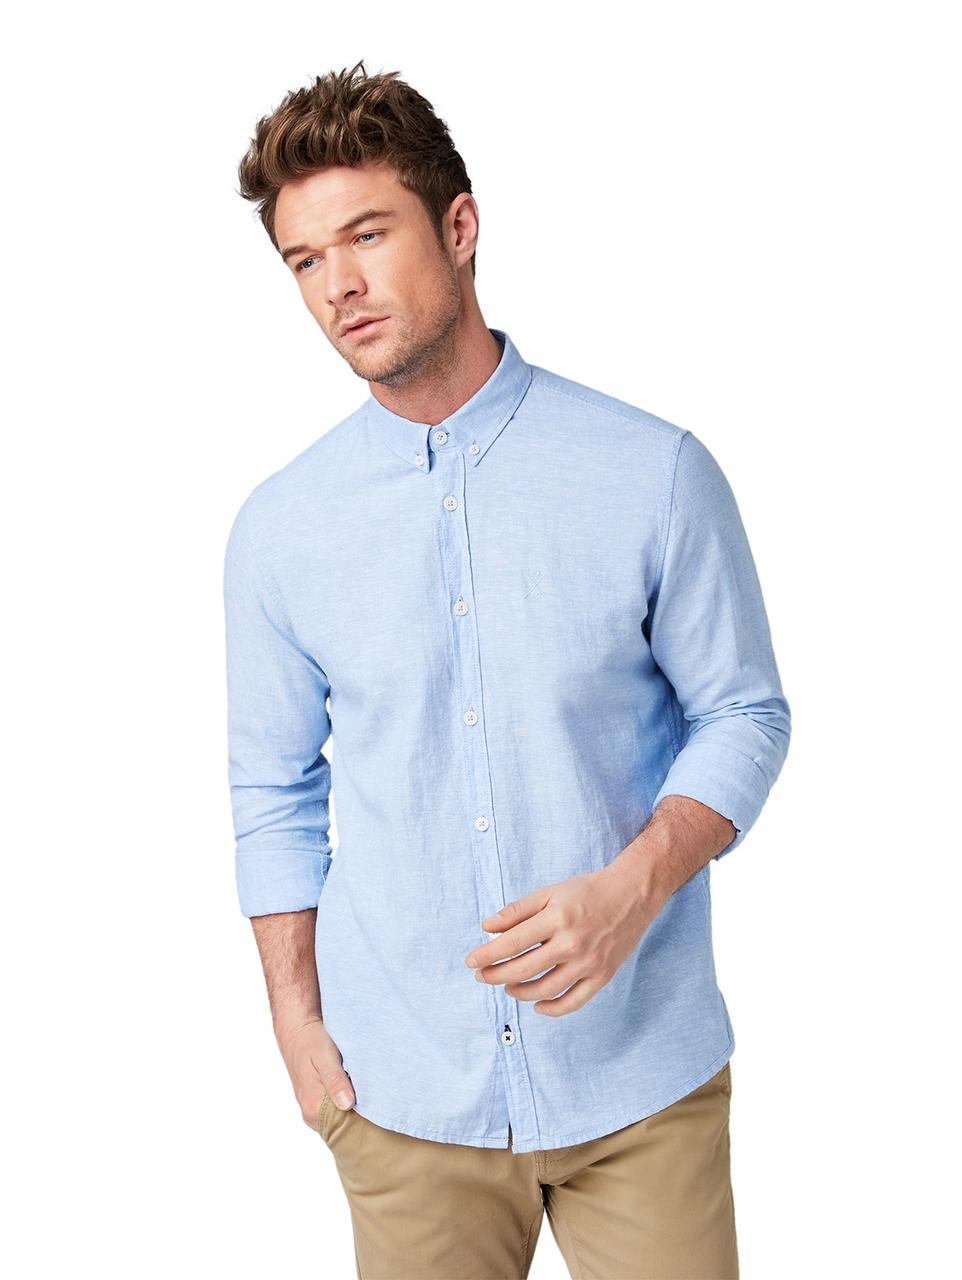 Рубашка Tom Tailor 1008935_11869 L Голубой